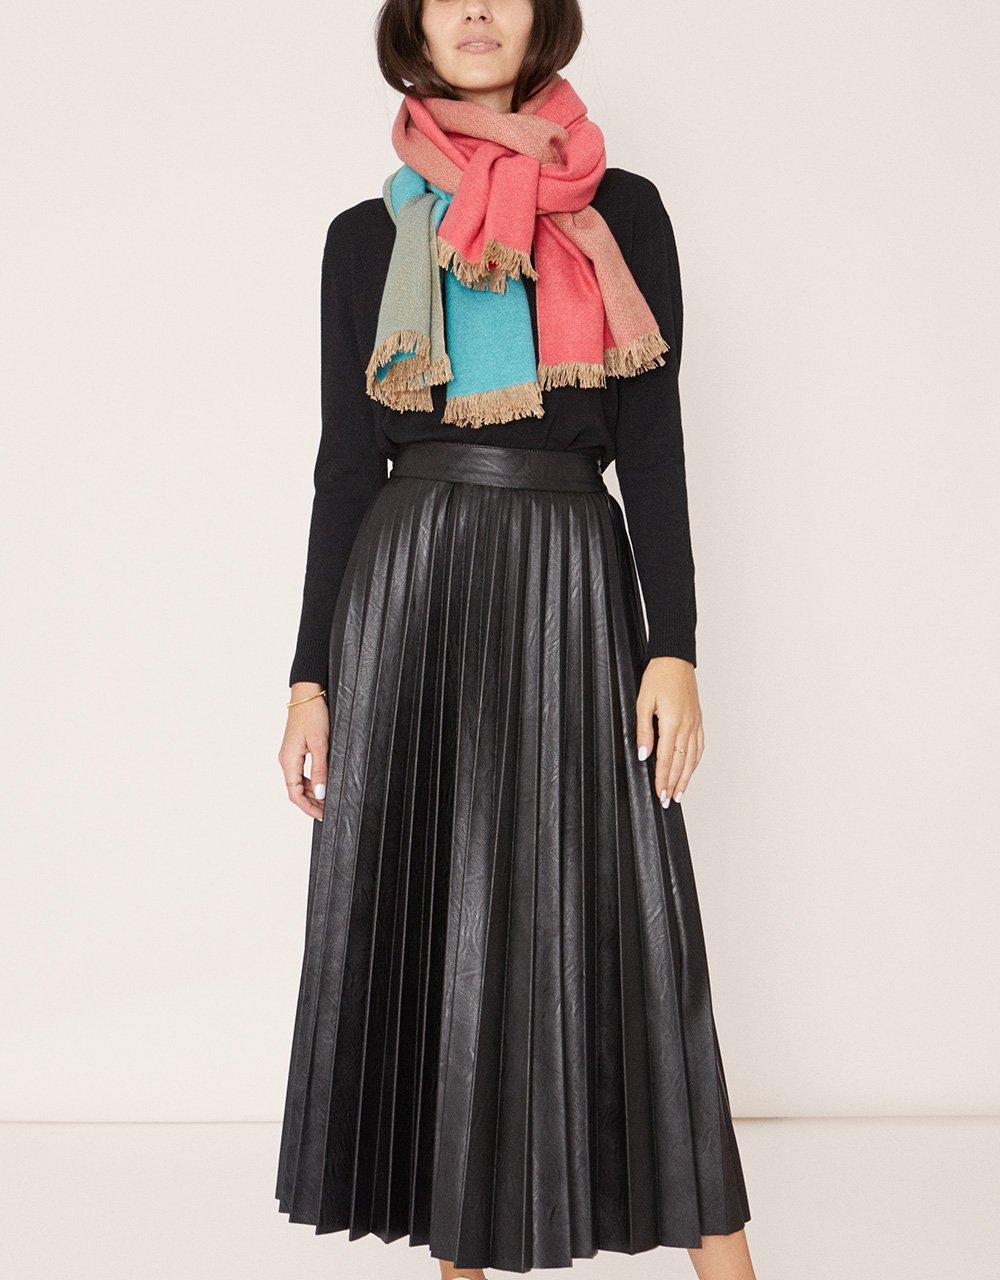 foulard03e